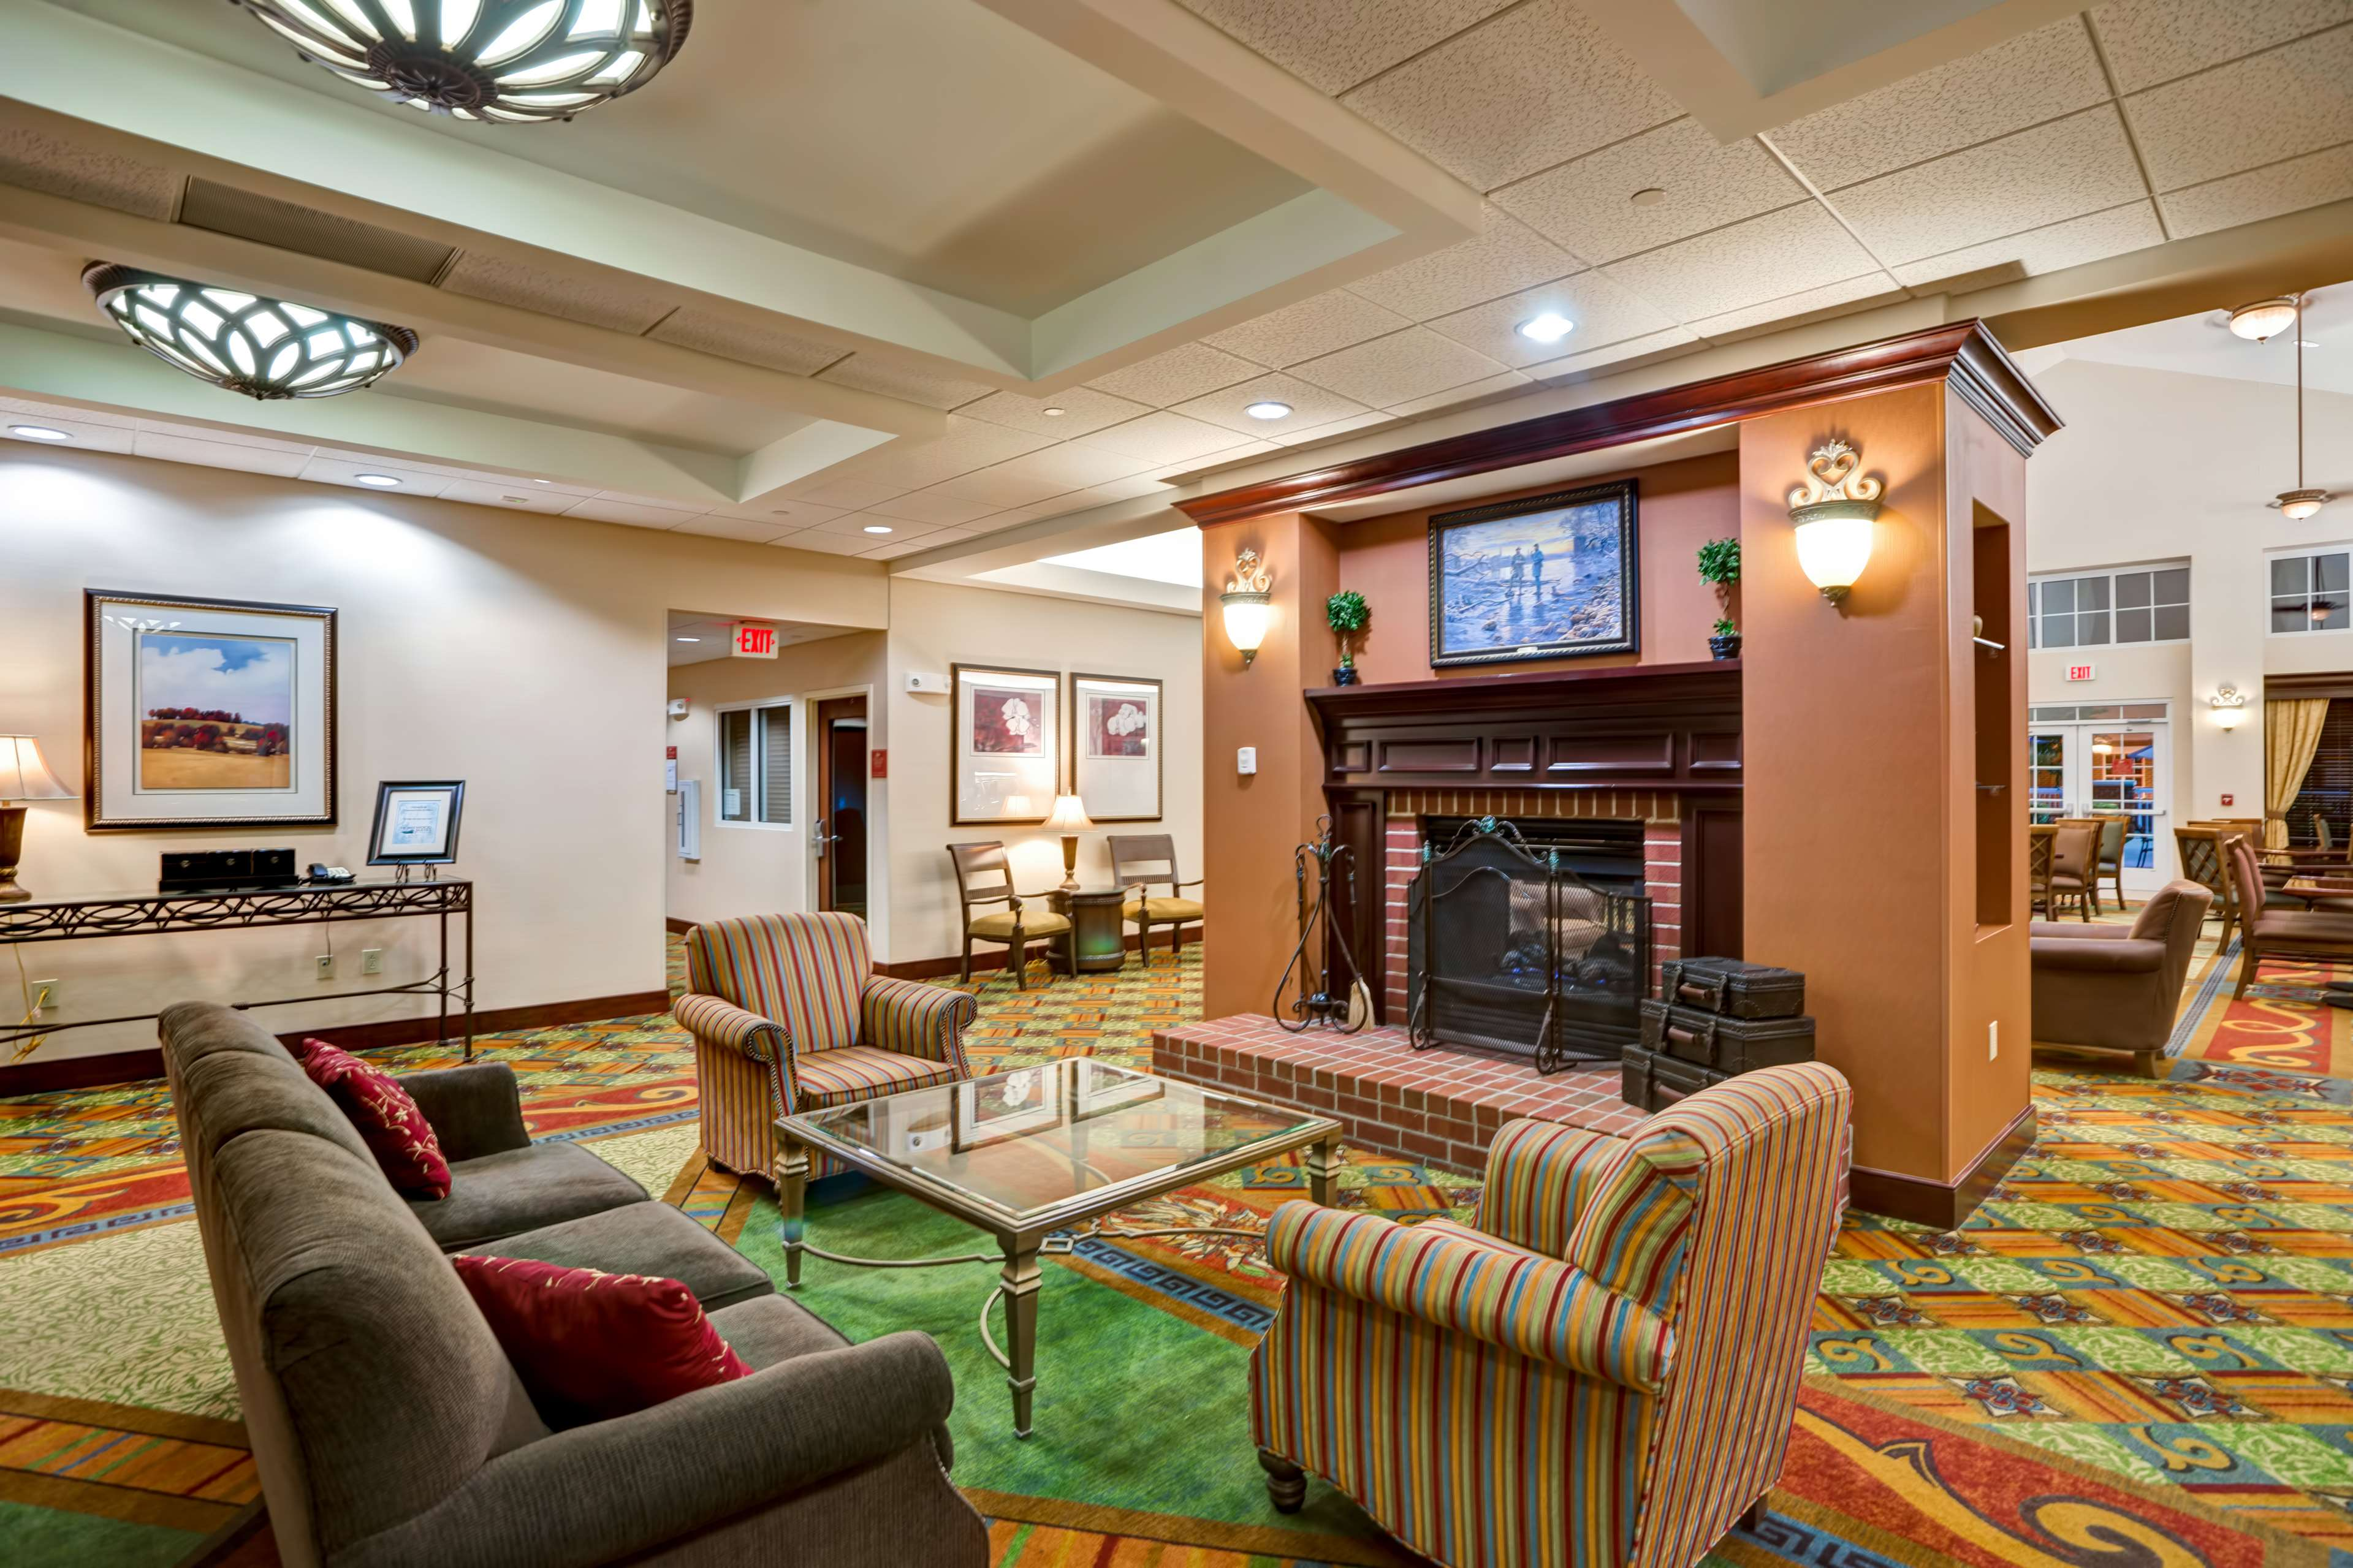 Homewood Suites by Hilton Fredericksburg image 2